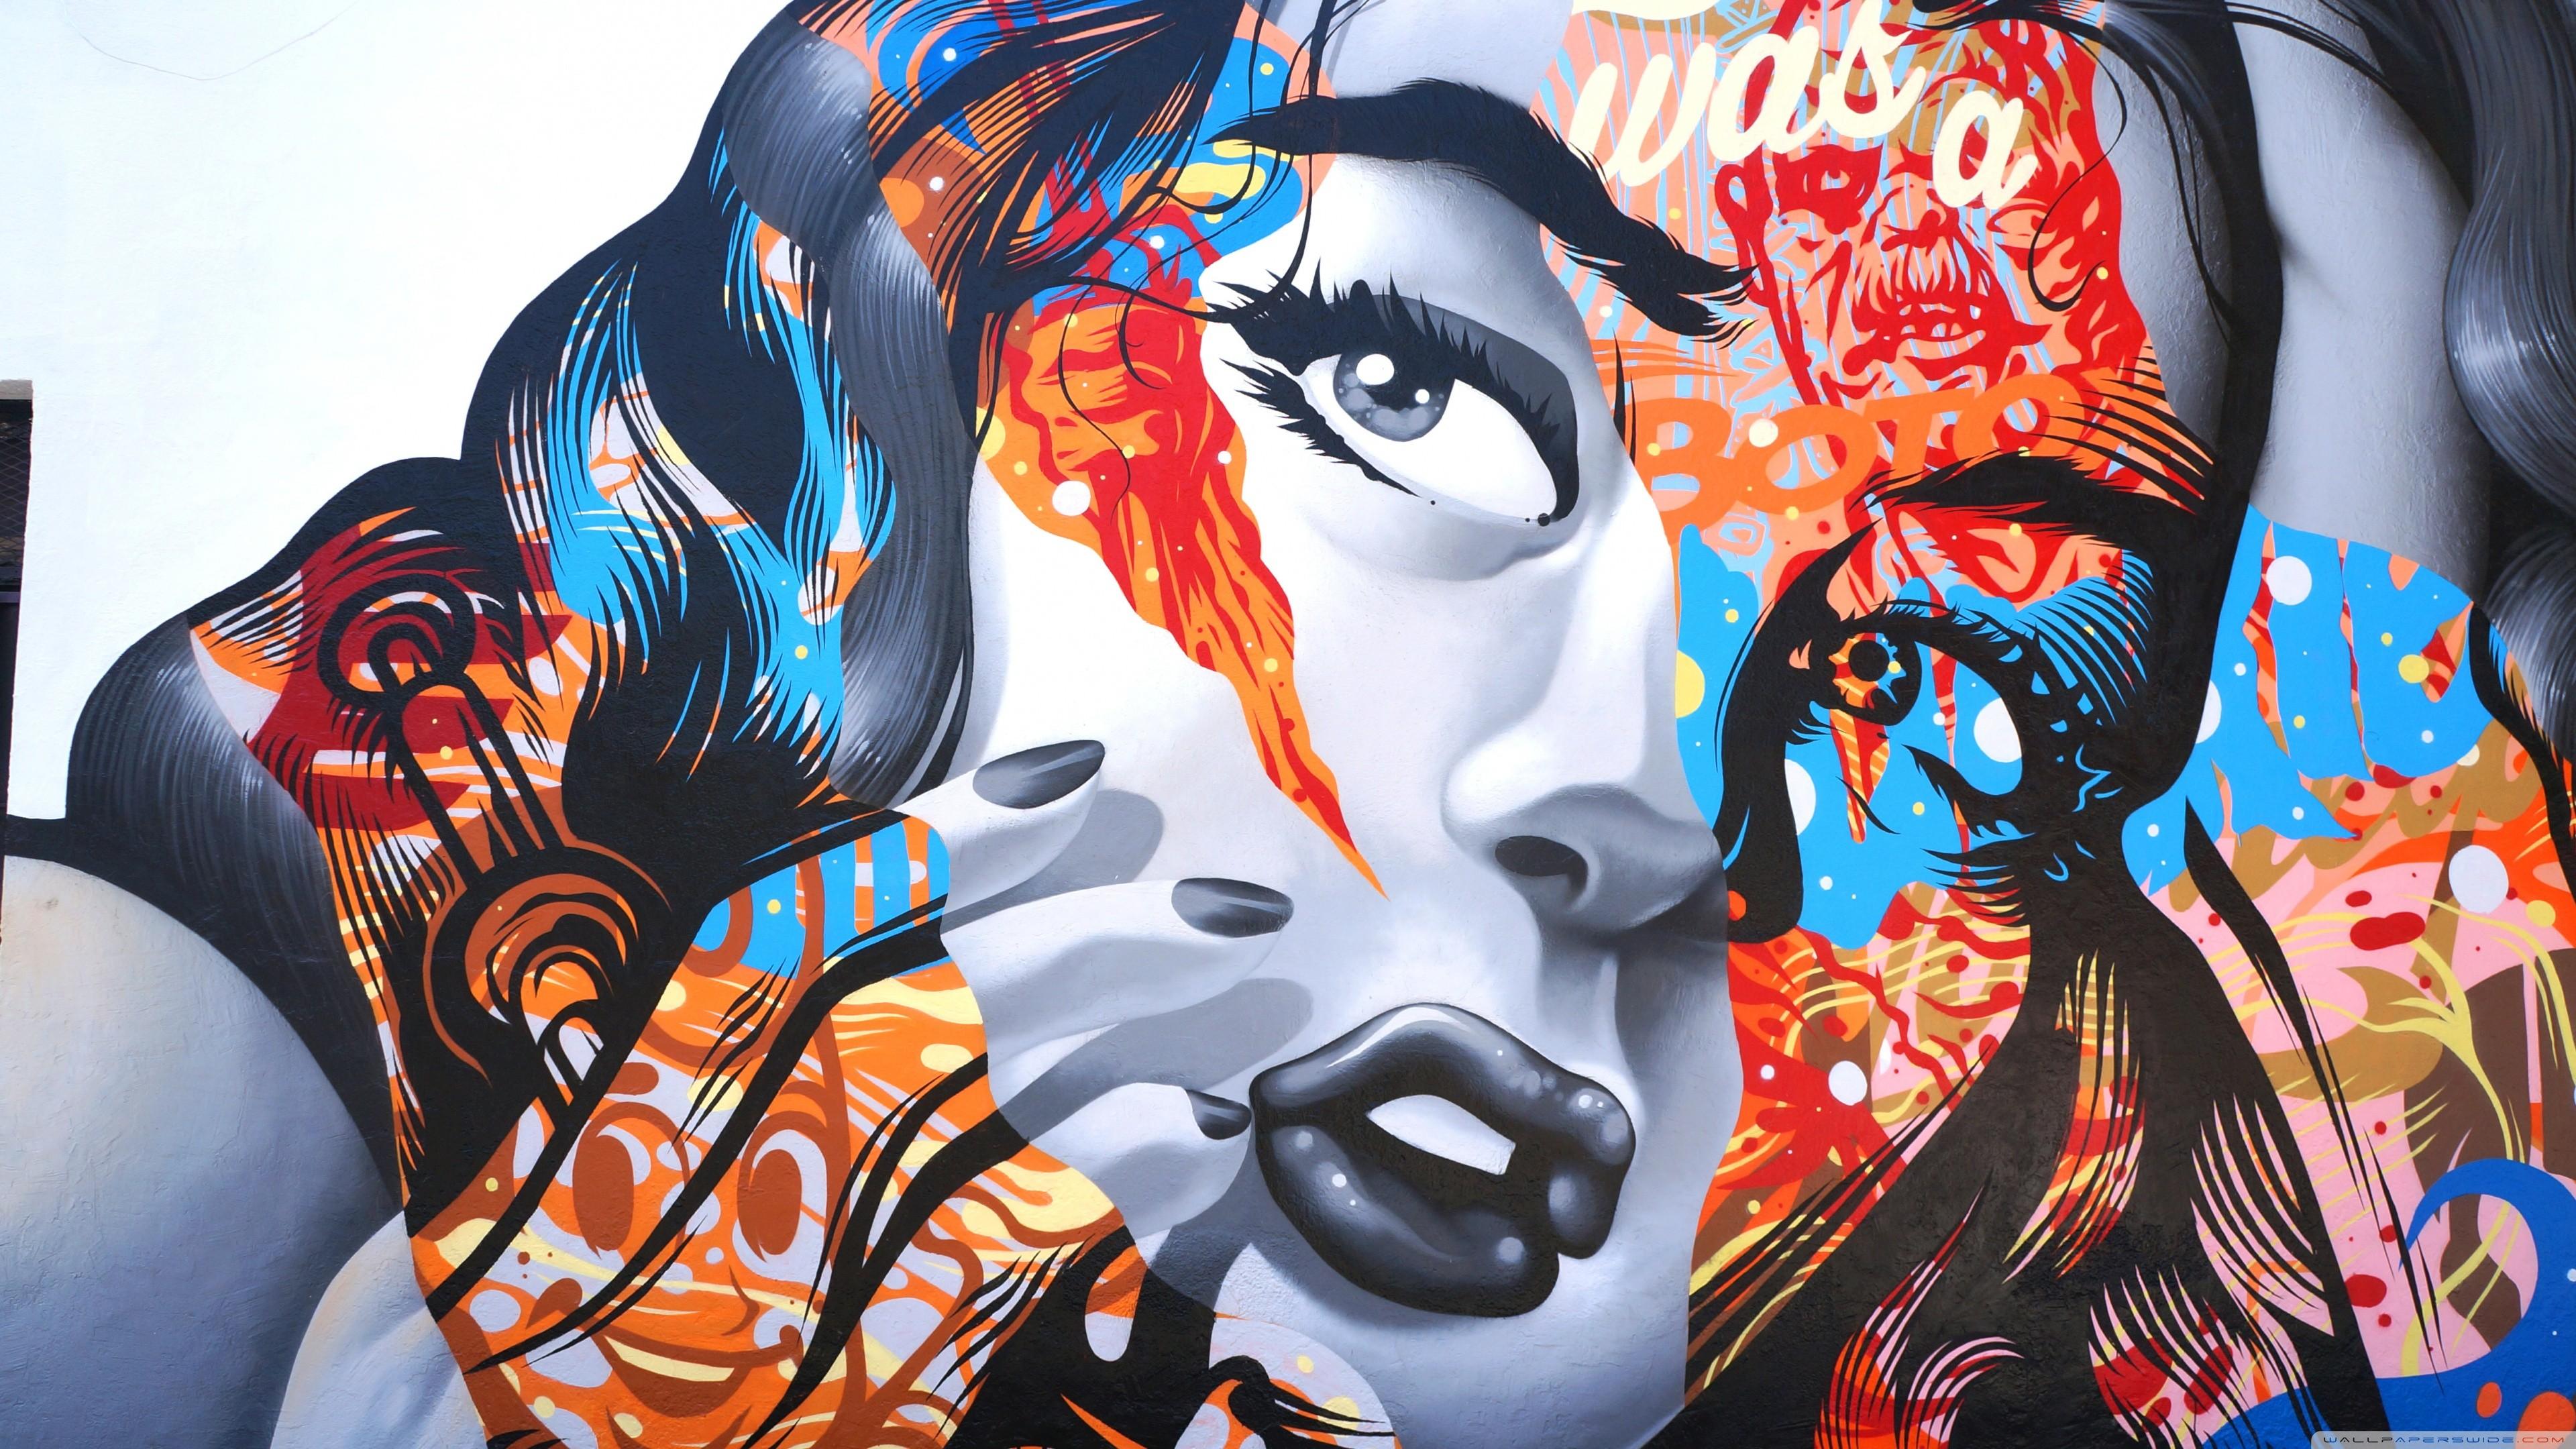 Bioshock infinite graffiti hd games 4k wallpapers images bioshock infinite graffiti voltagebd Image collections